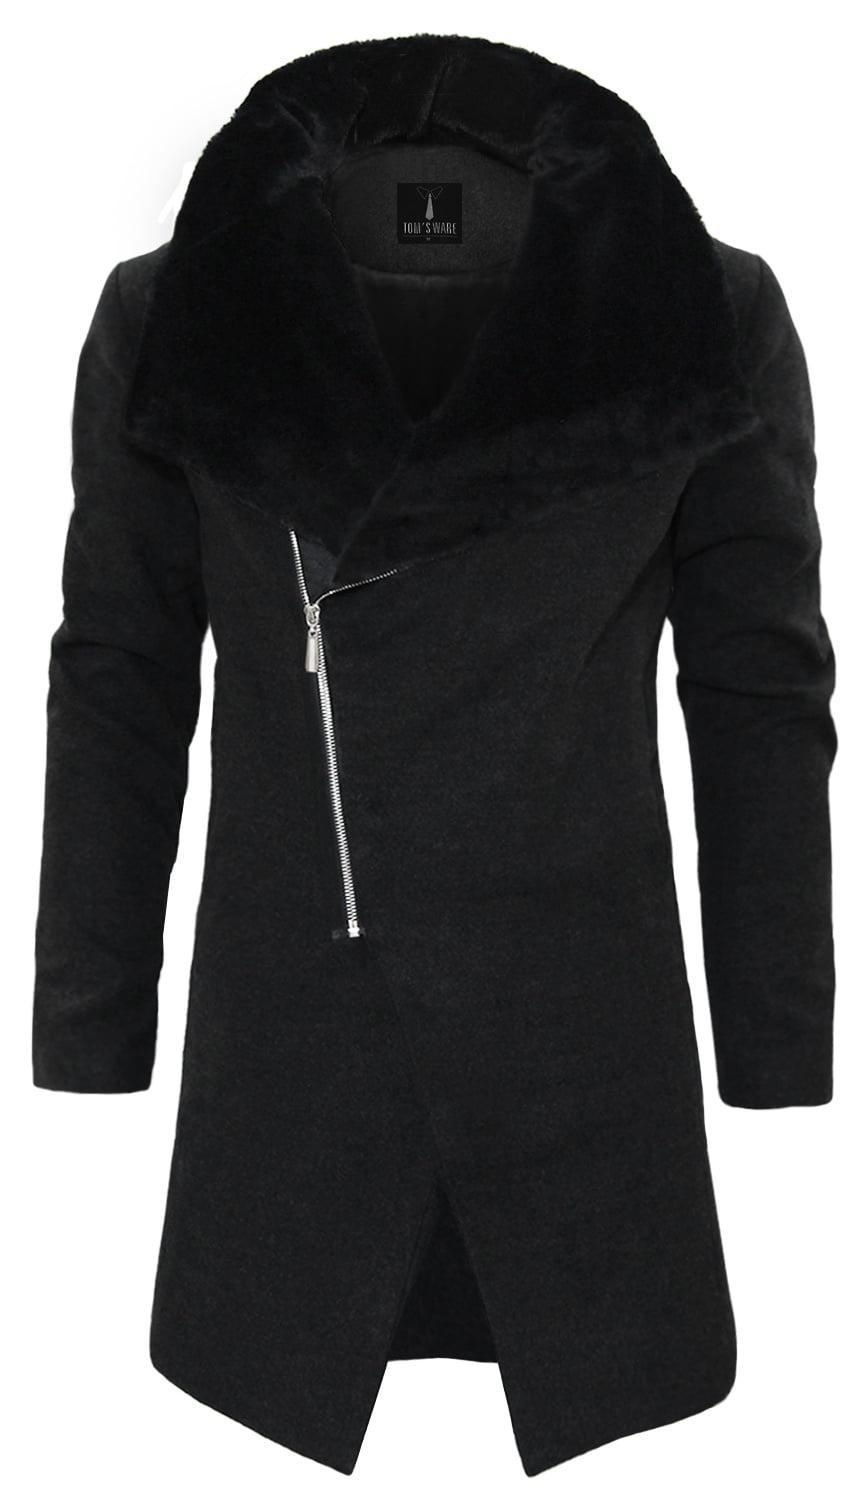 TAM WARE Men Stylish Fur Large Lapels Zip-up Wool Blend Coat by TAM WARE